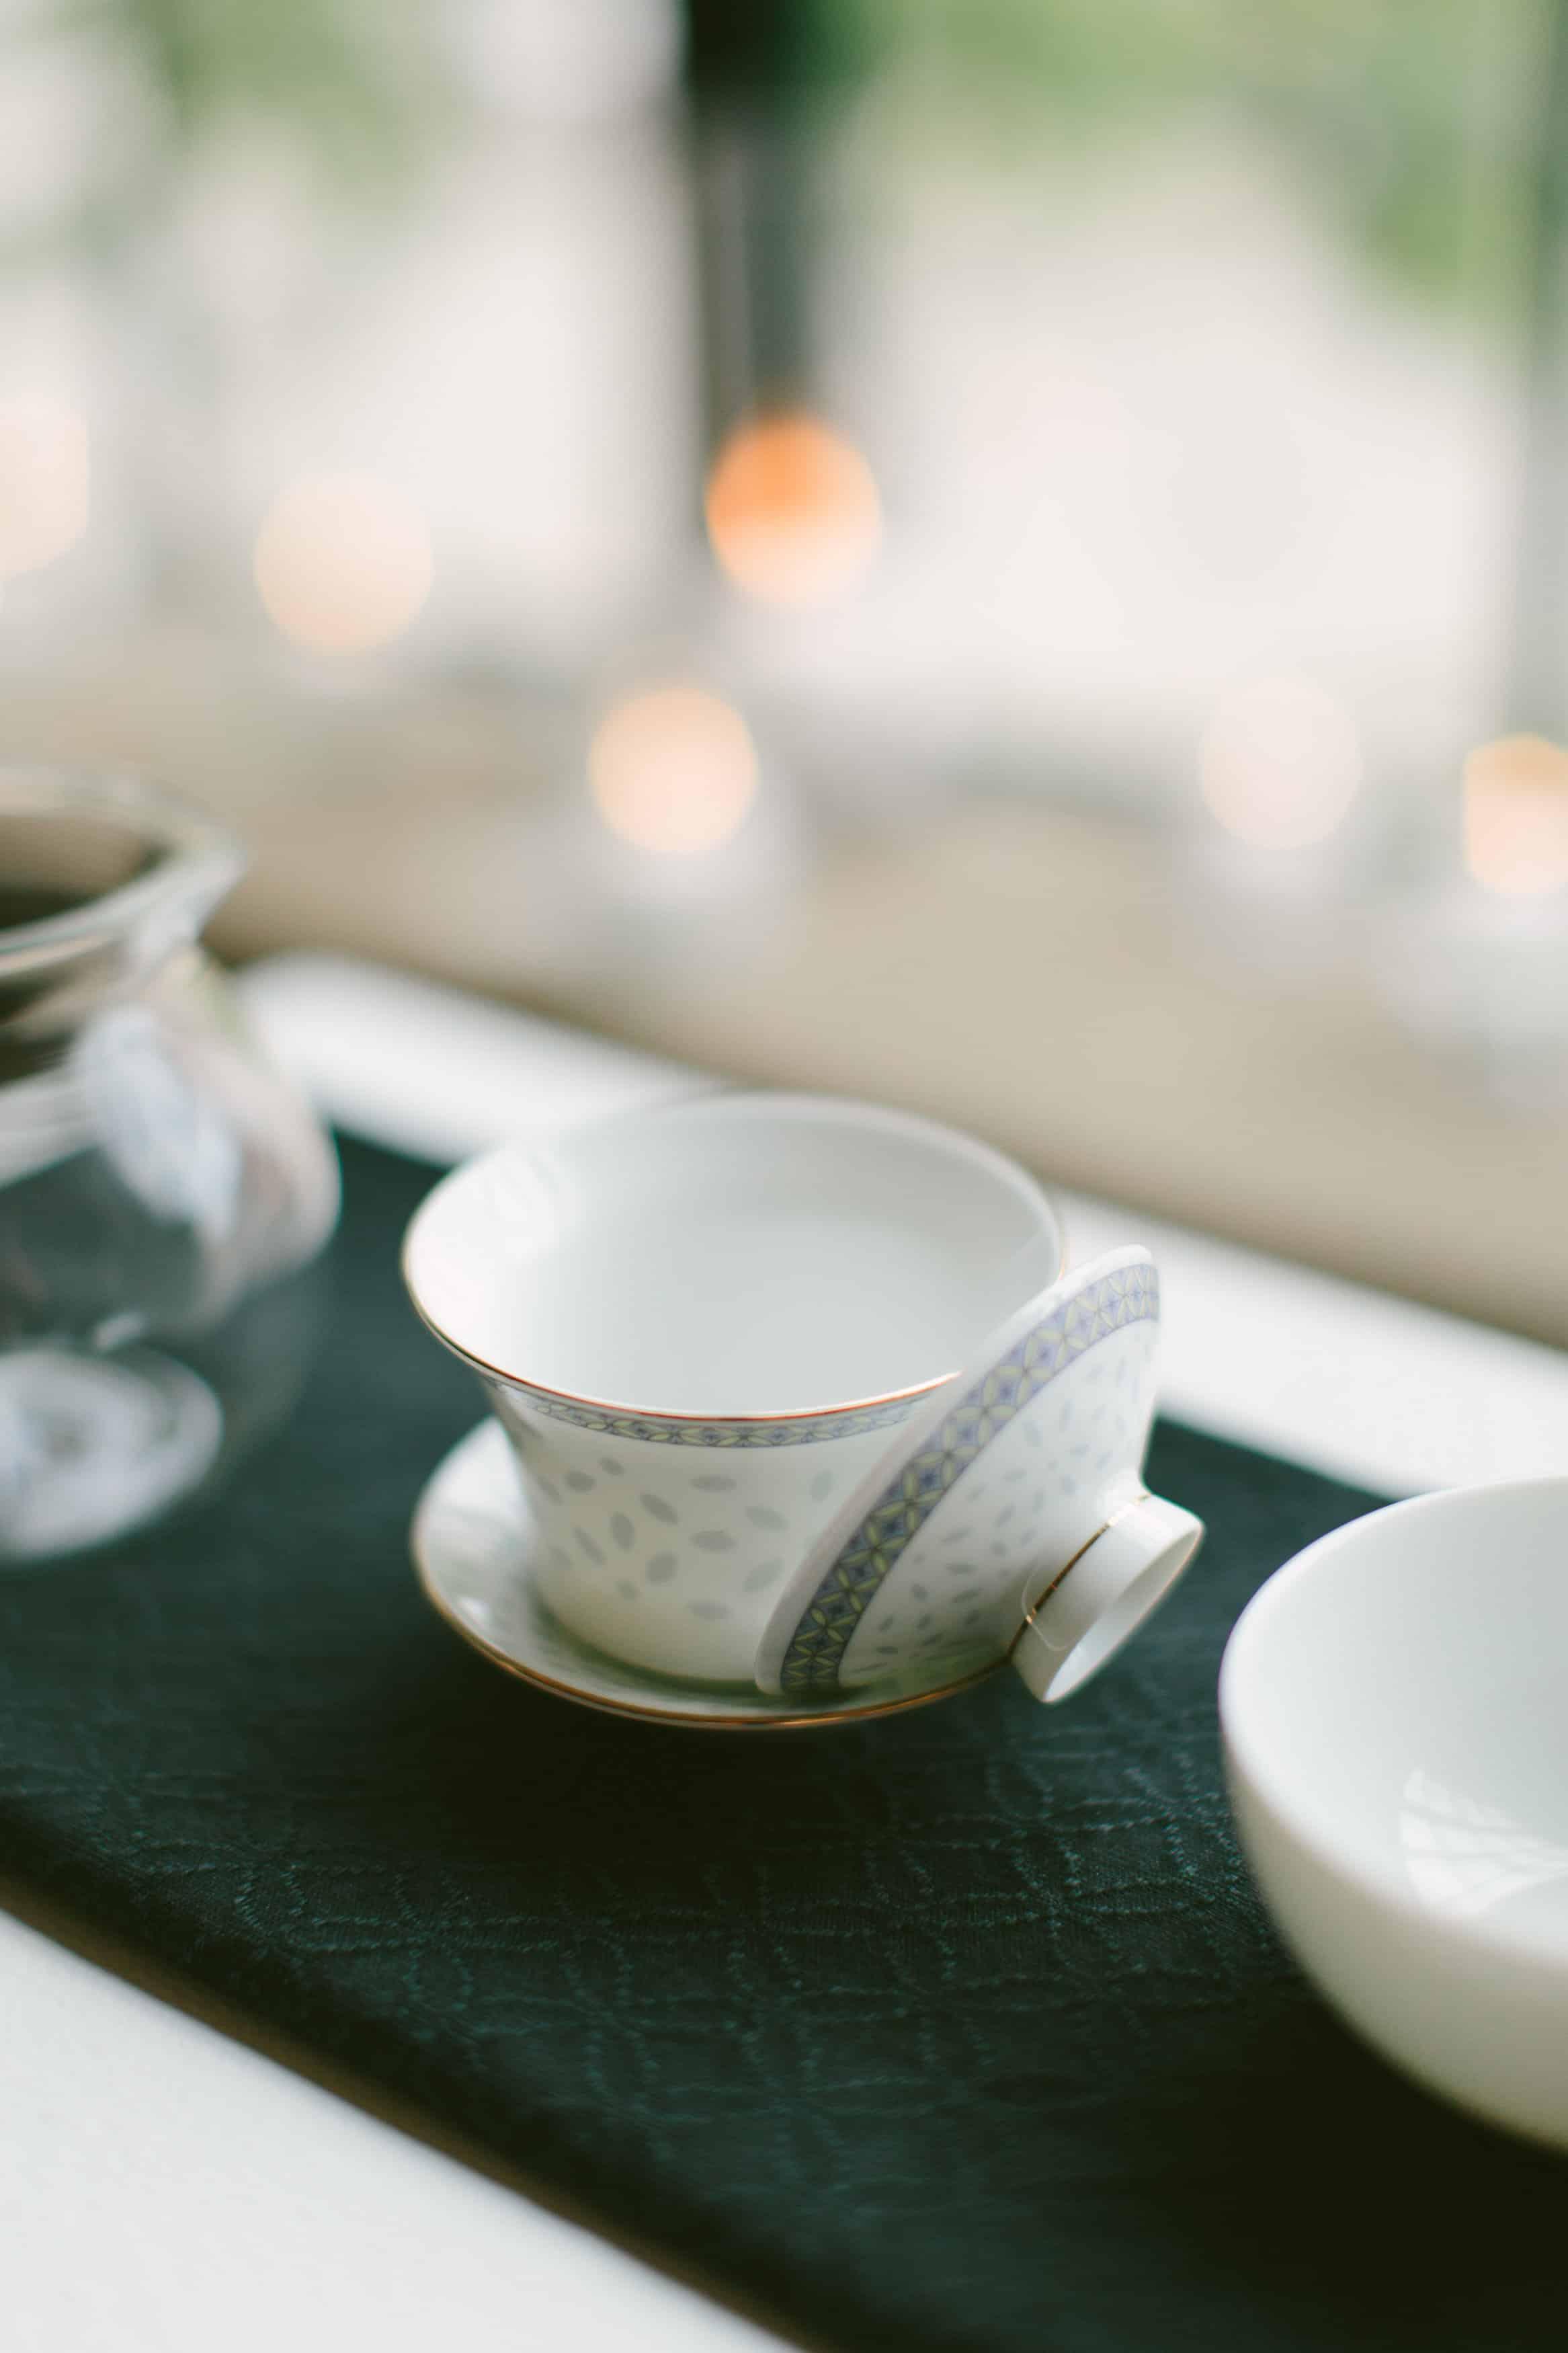 The wedding tea ware